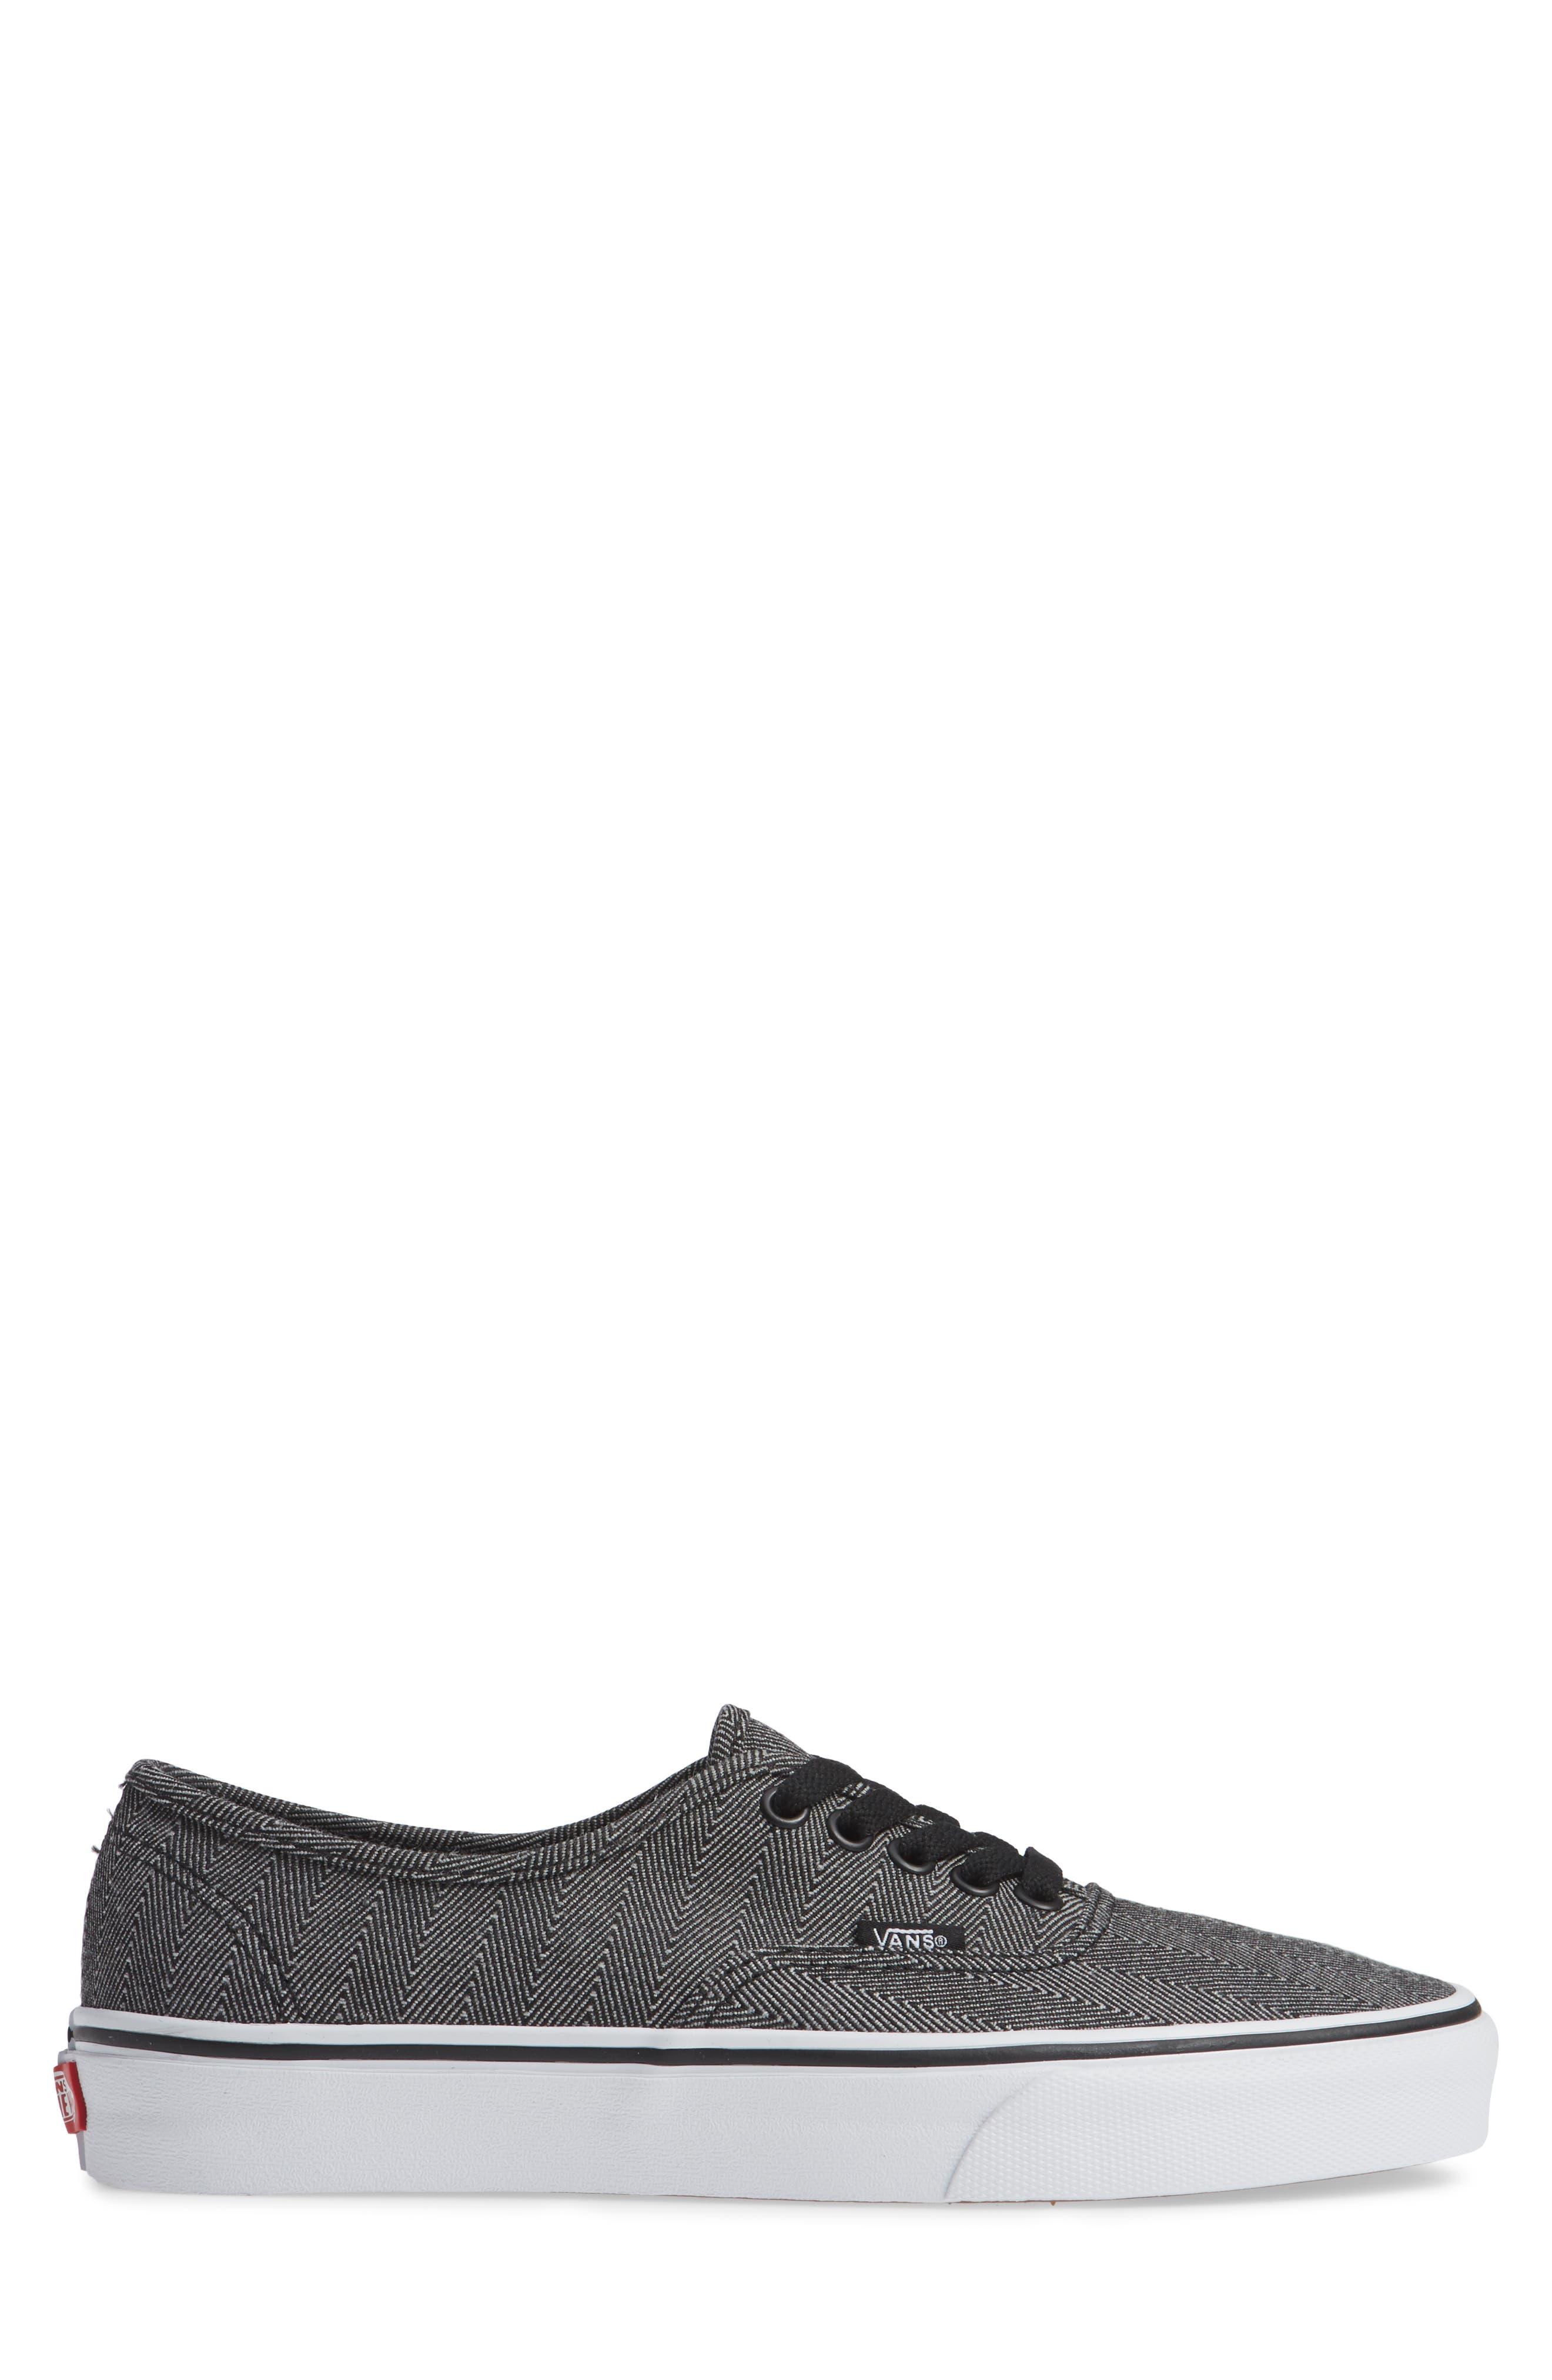 UA Authentic Sneaker,                             Alternate thumbnail 3, color,                             BLACK/ TRUE WHITE